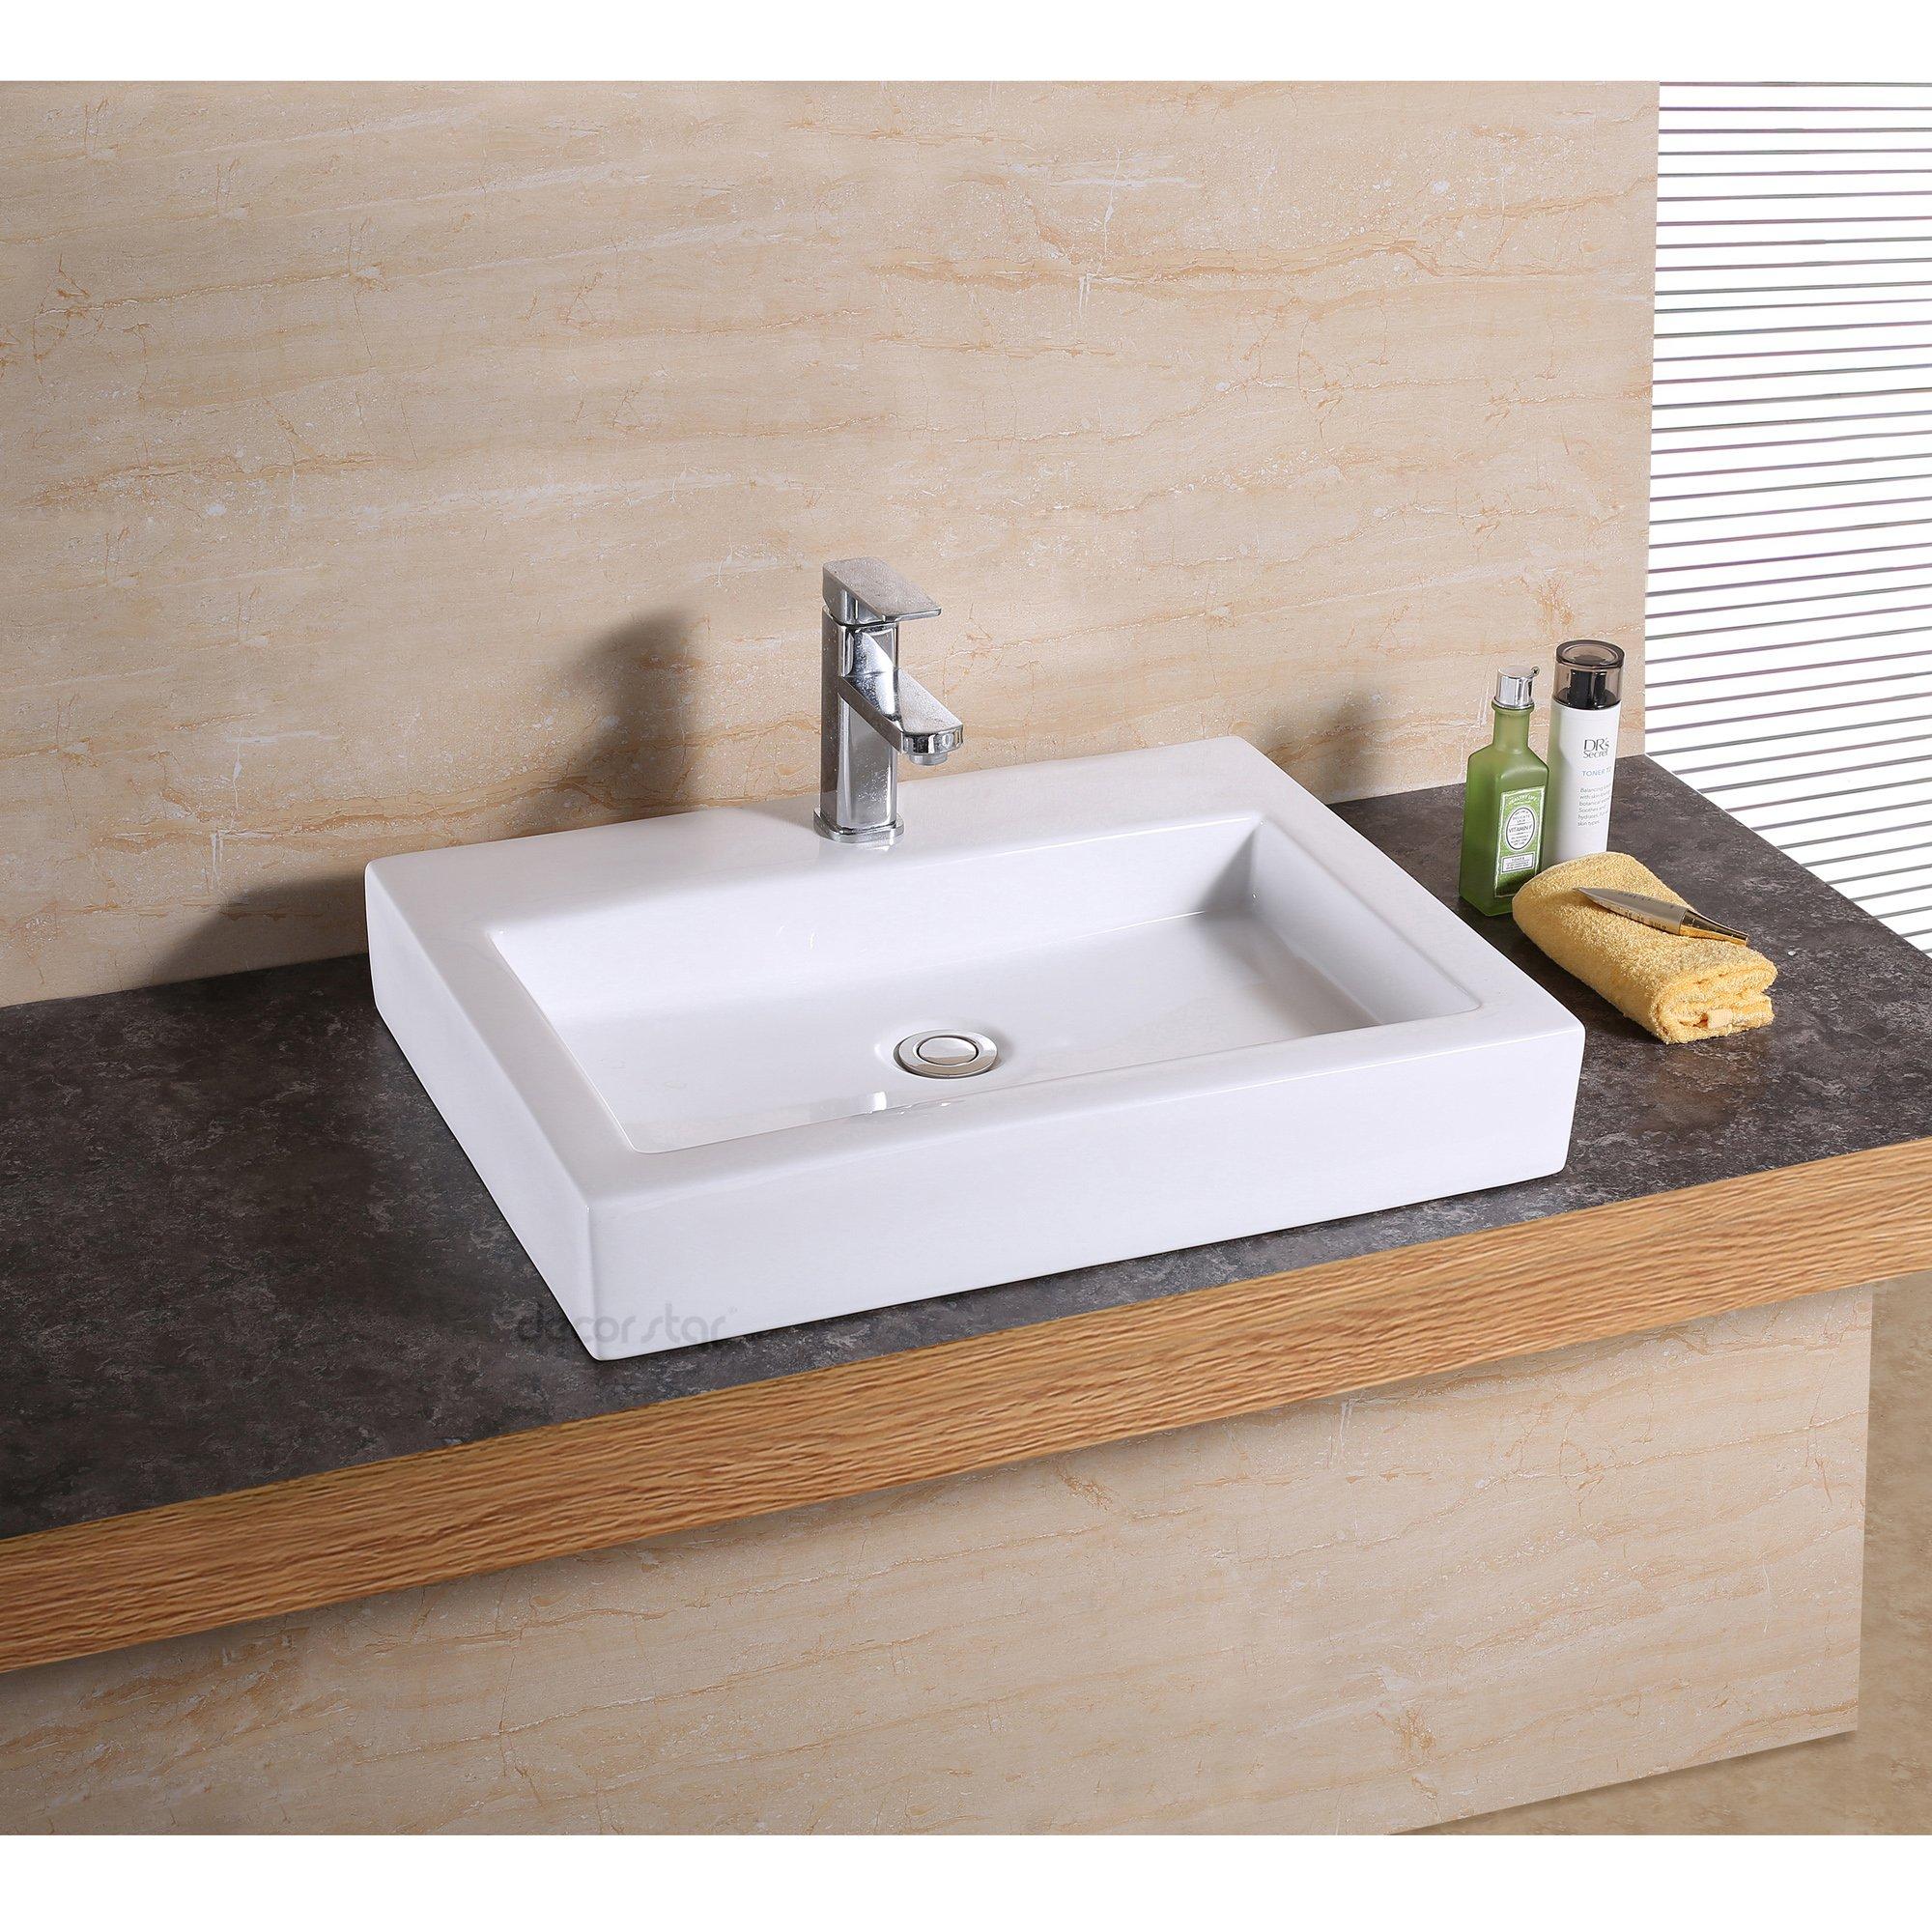 Decor Star CB-021 Bathroom Porcelain Ceramic Vessel Vanity Sink Art Basin